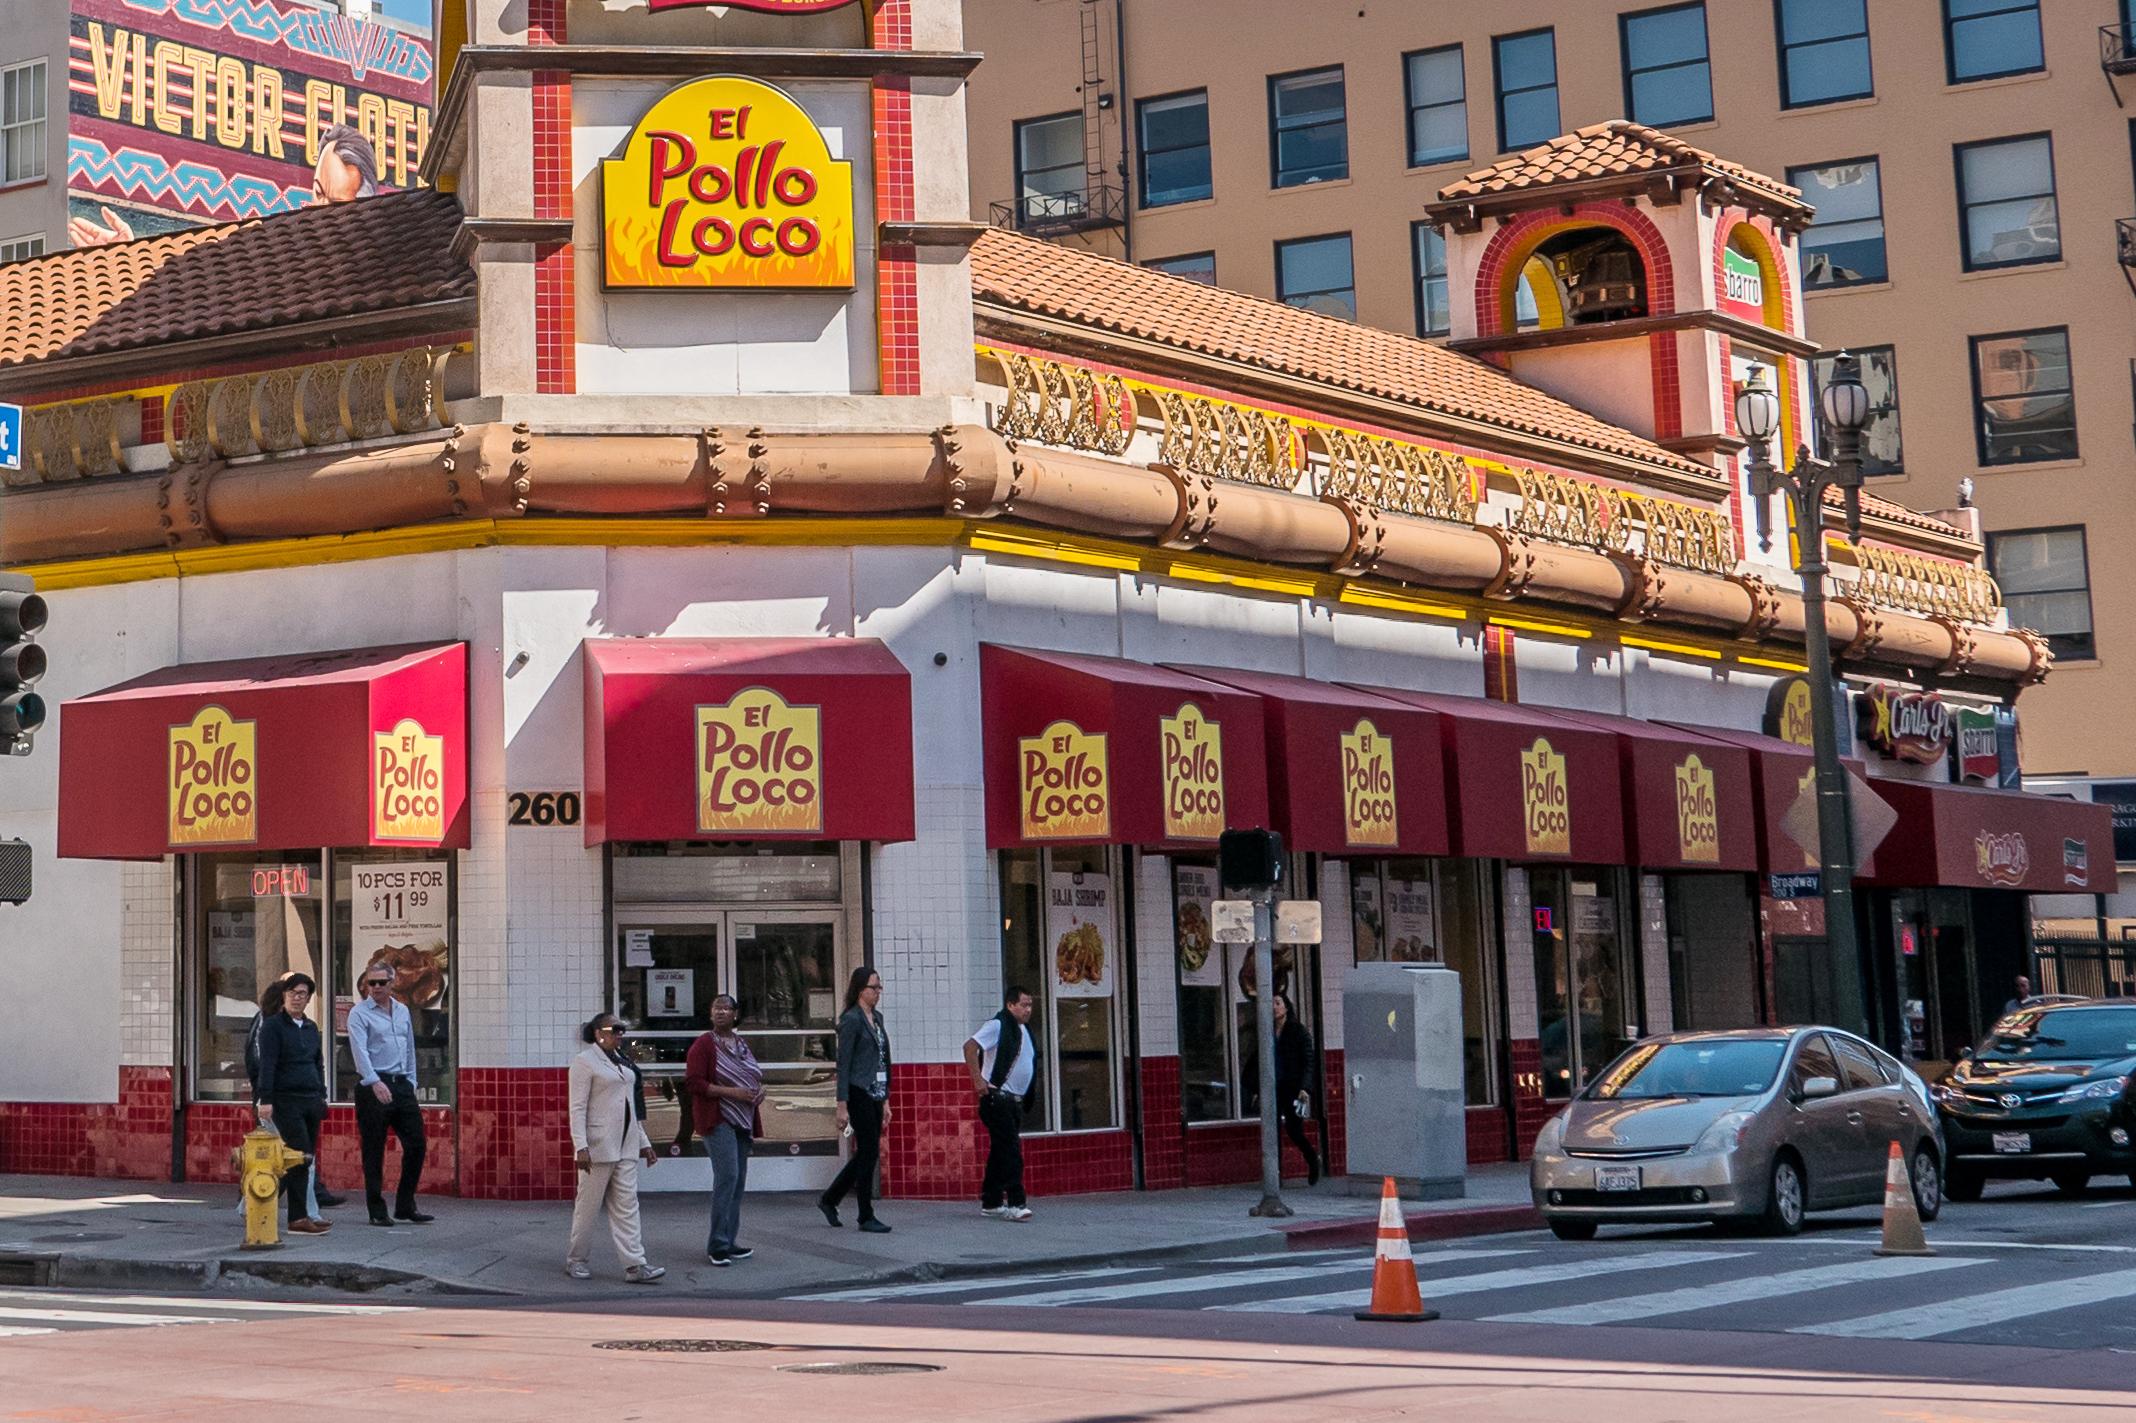 180405-fast-food-chains-el-pollo-loco